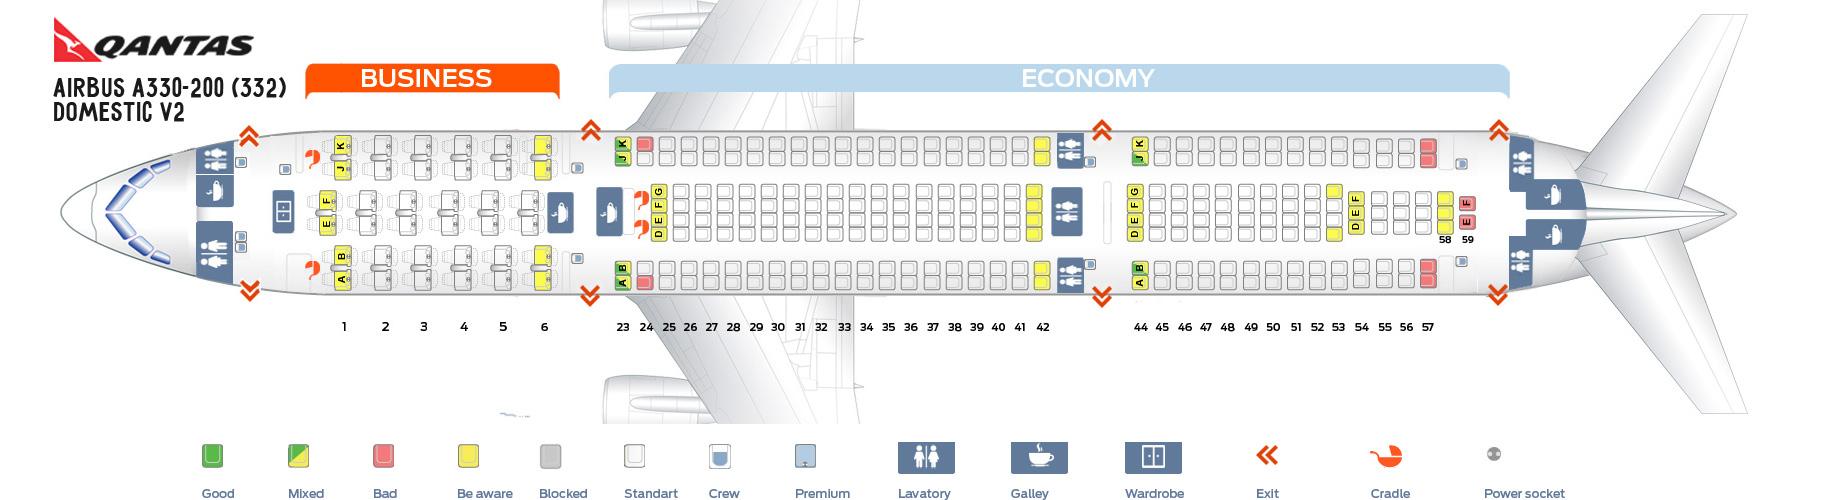 Seat Map Airbus A330-200 Domestic V2 Qantas Airways